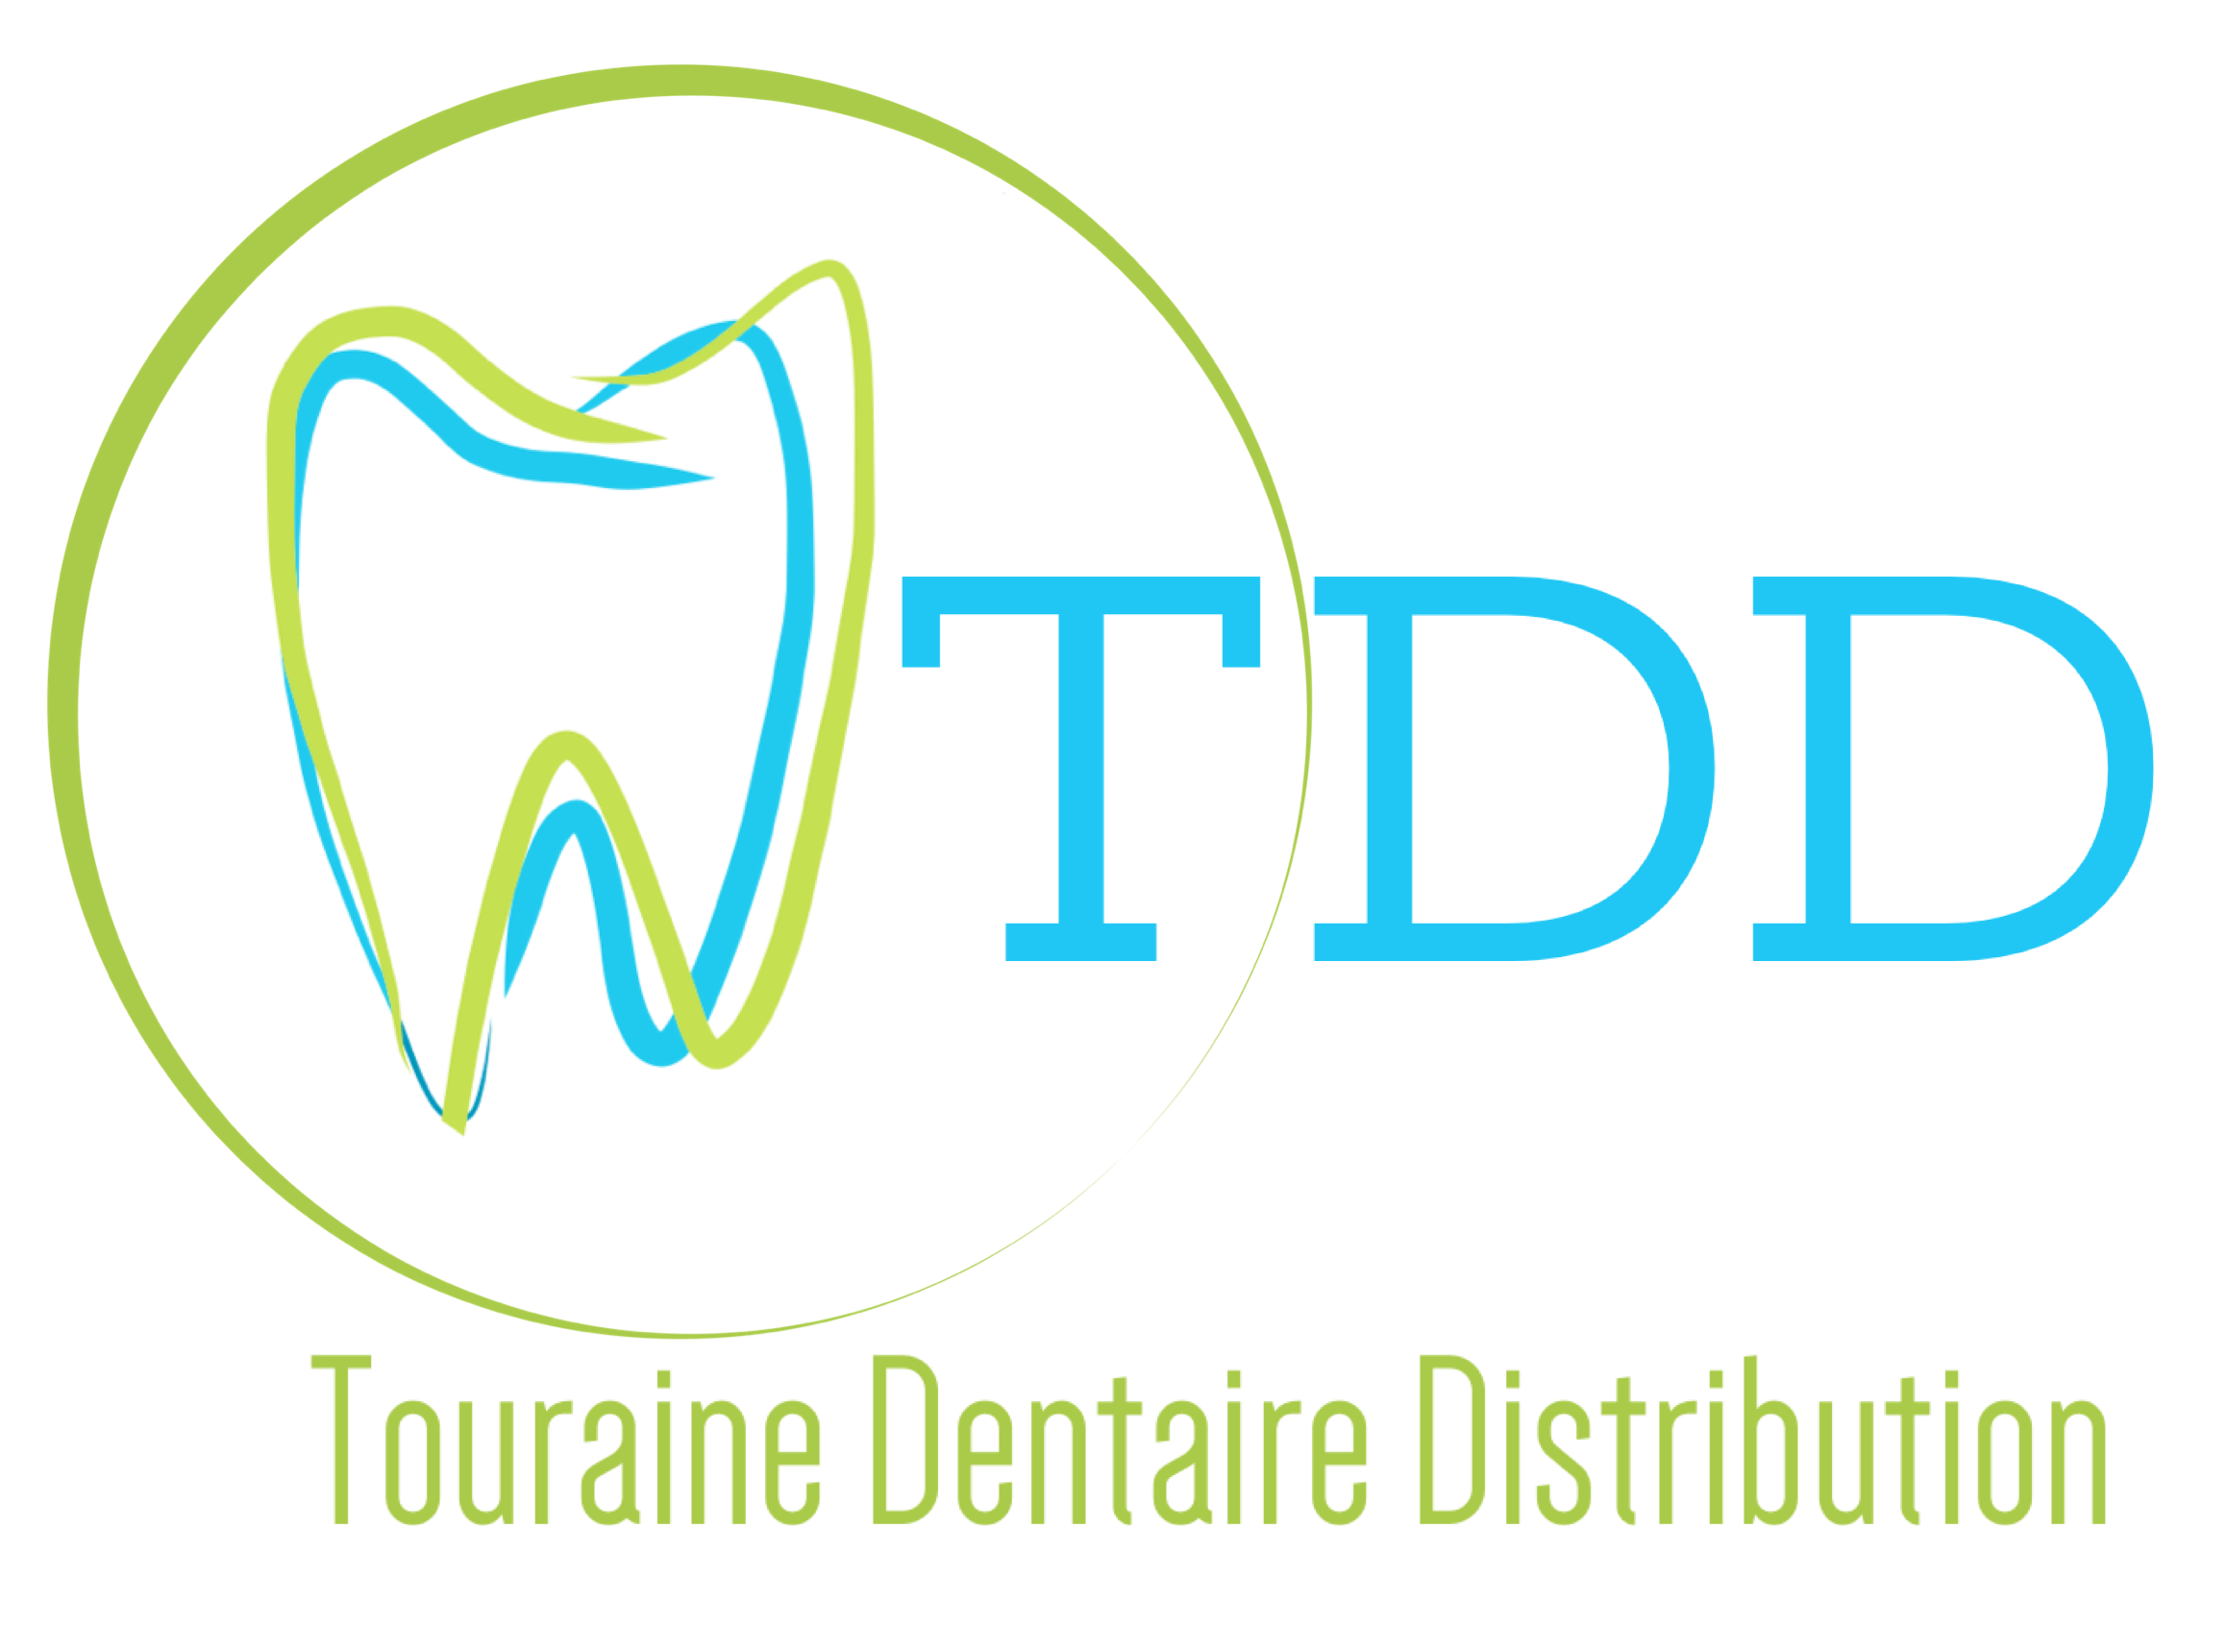 Touraine Dentaire Distribution